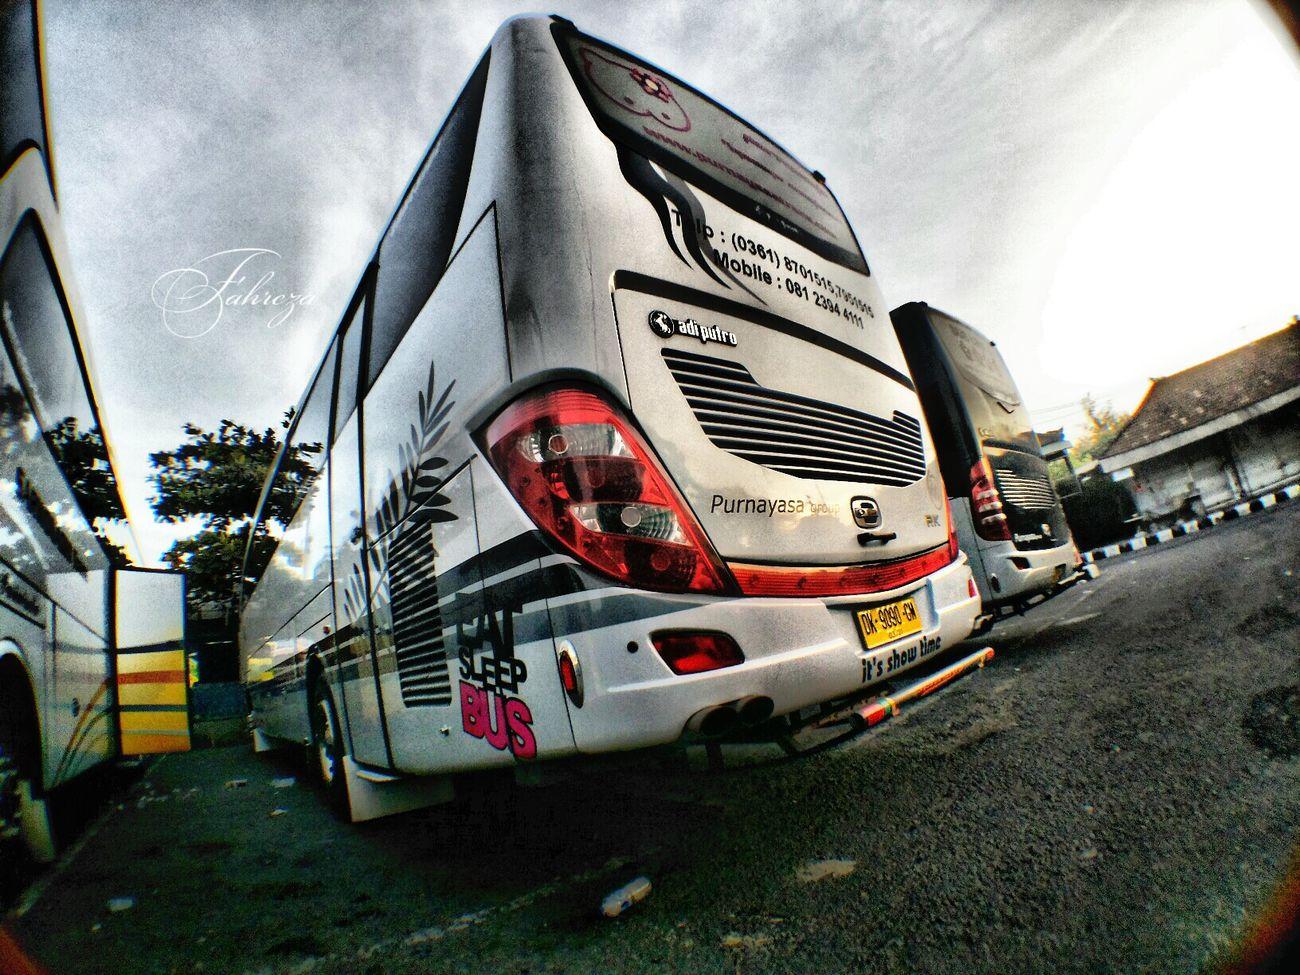 Snapshots Of Life BismaniaCommunity Bismania Sukafotobis Busporn Bisphotogram Enjoying Life Hello World Bali, Indonesia Tanahlot Tanahlot, Bali, Indonesia Wonderful Indonesia Likeforlike #likemyphoto #qlikemyphotos #like4like #likemypic #likeback #ilikeback #10likes #50likes #100likes #20likes #likere Follow Follow4follow Followback Follow #f4f #followme #TagsForLikes #TFLers #followforfollow #follow4follow #teamfollowback #followher #followbackteam #followh First Eyeem Photo